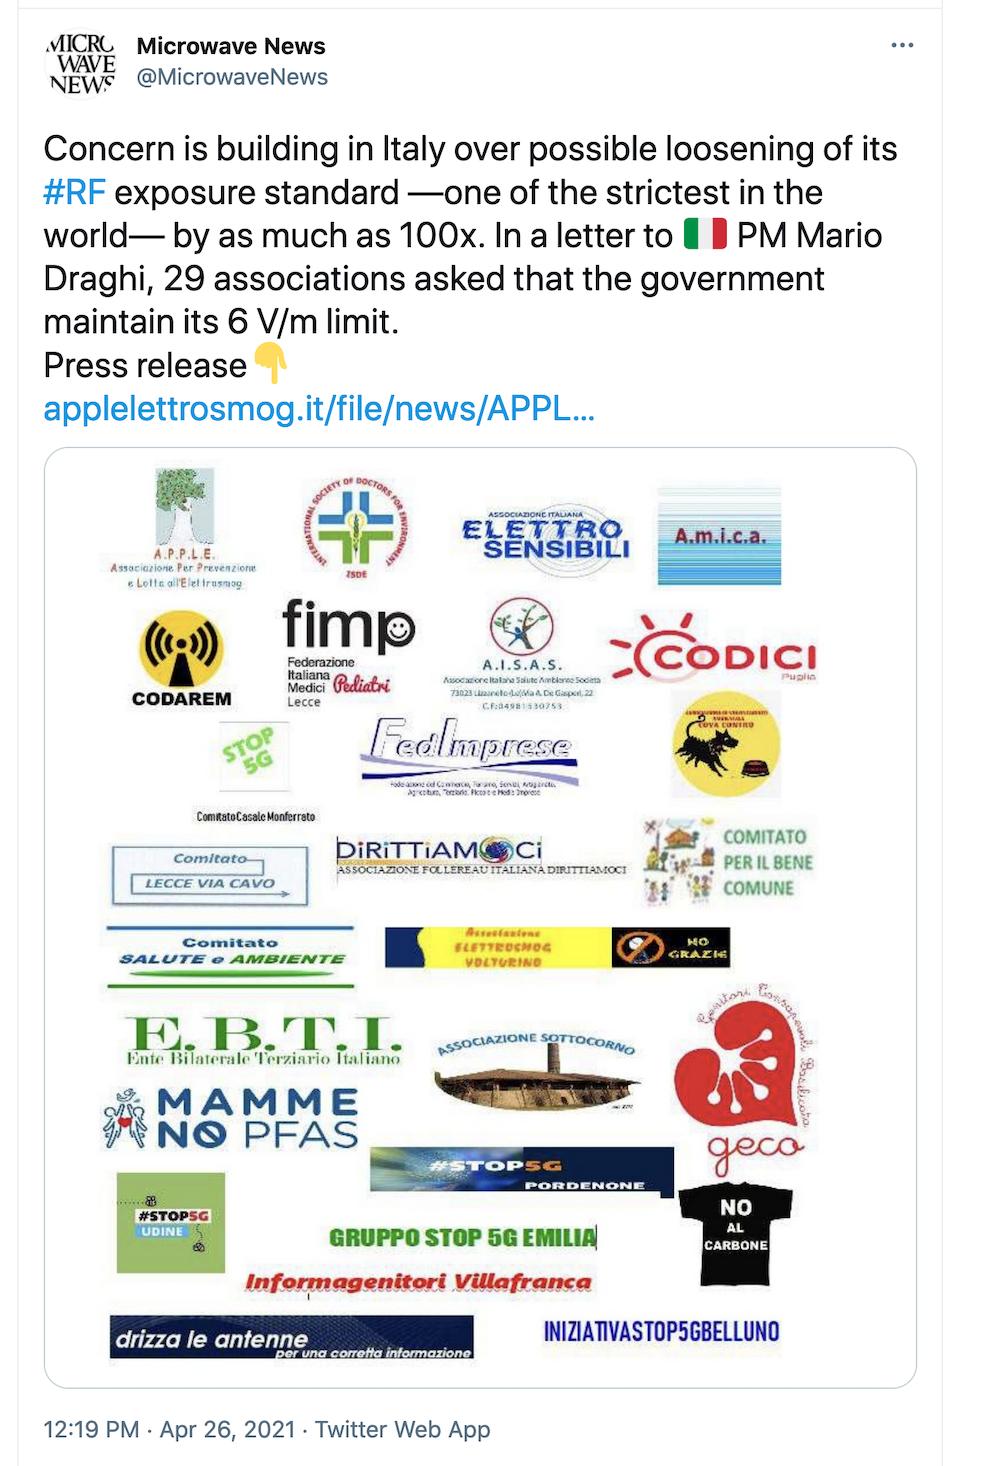 Microwave News Tweet on Italy 6 V/m Limit, Pt1